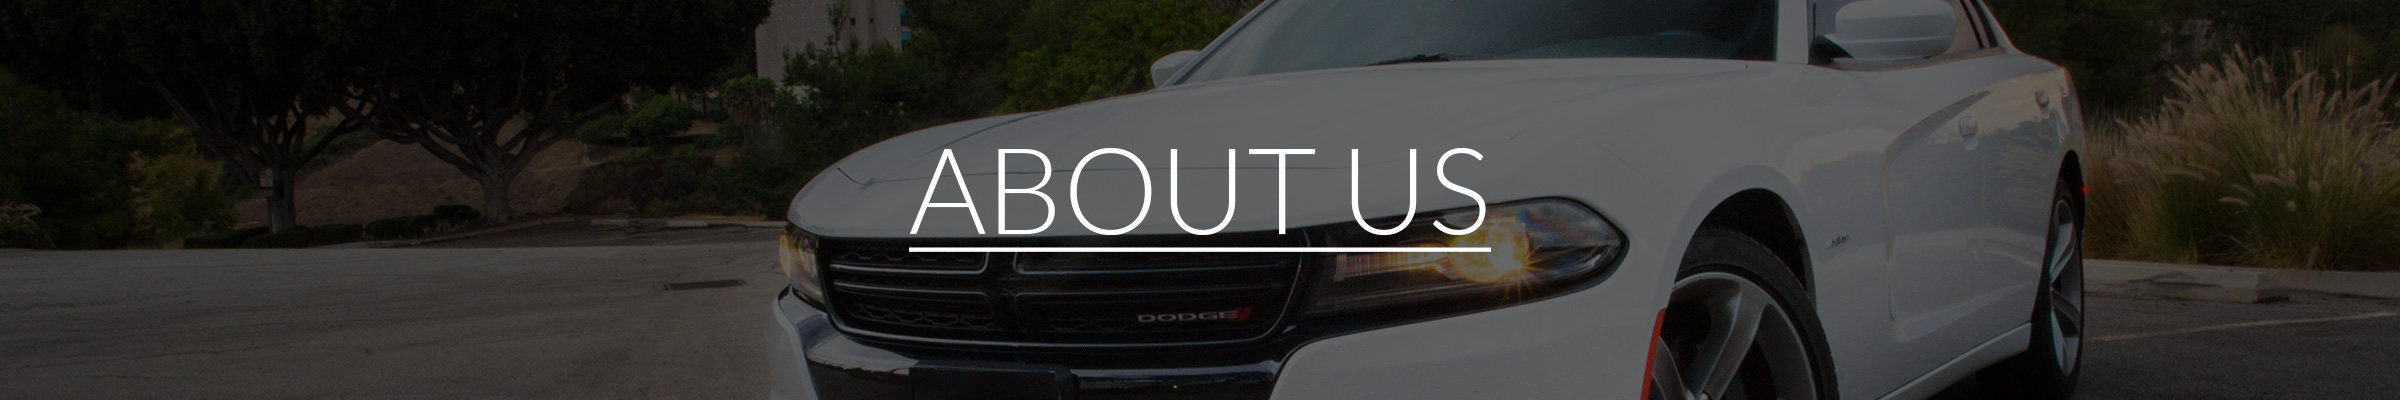 About Us - ZIA AUTO WHOLESALERS LLC